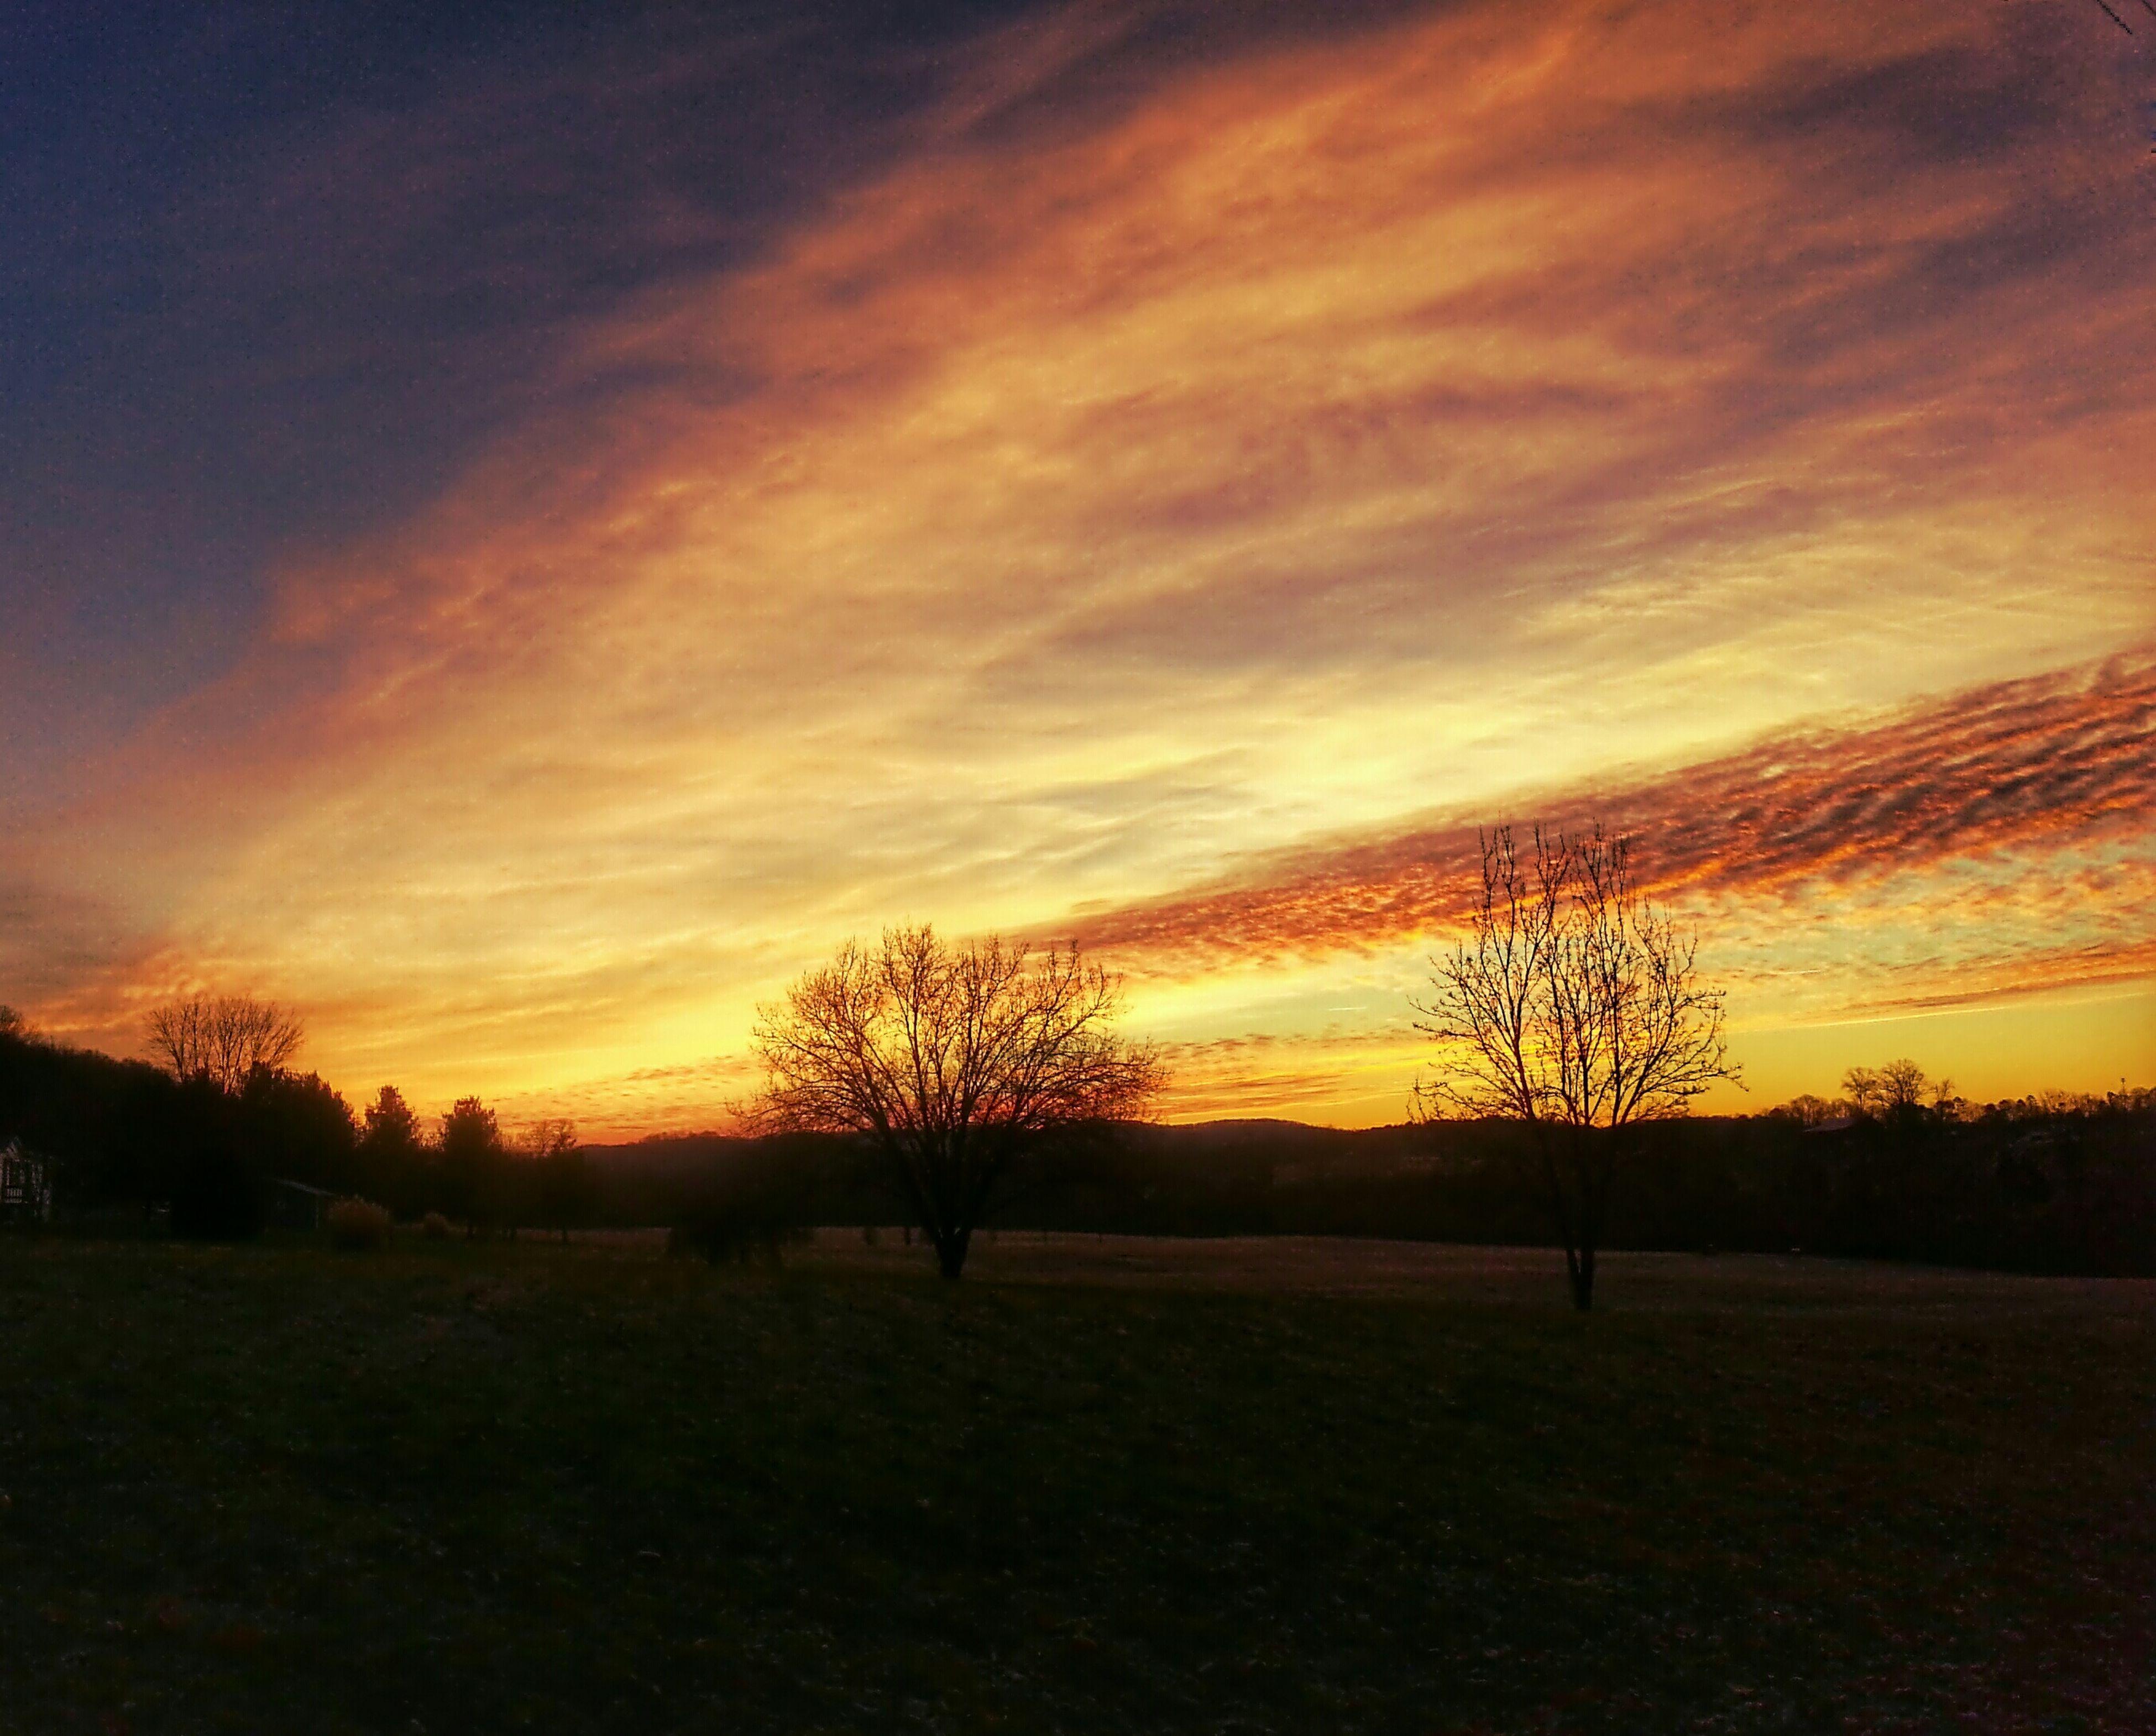 sunset, sky, tranquil scene, tranquility, landscape, silhouette, scenics, tree, bare tree, beauty in nature, field, orange color, nature, cloud - sky, idyllic, cloud, non-urban scene, dramatic sky, outdoors, remote